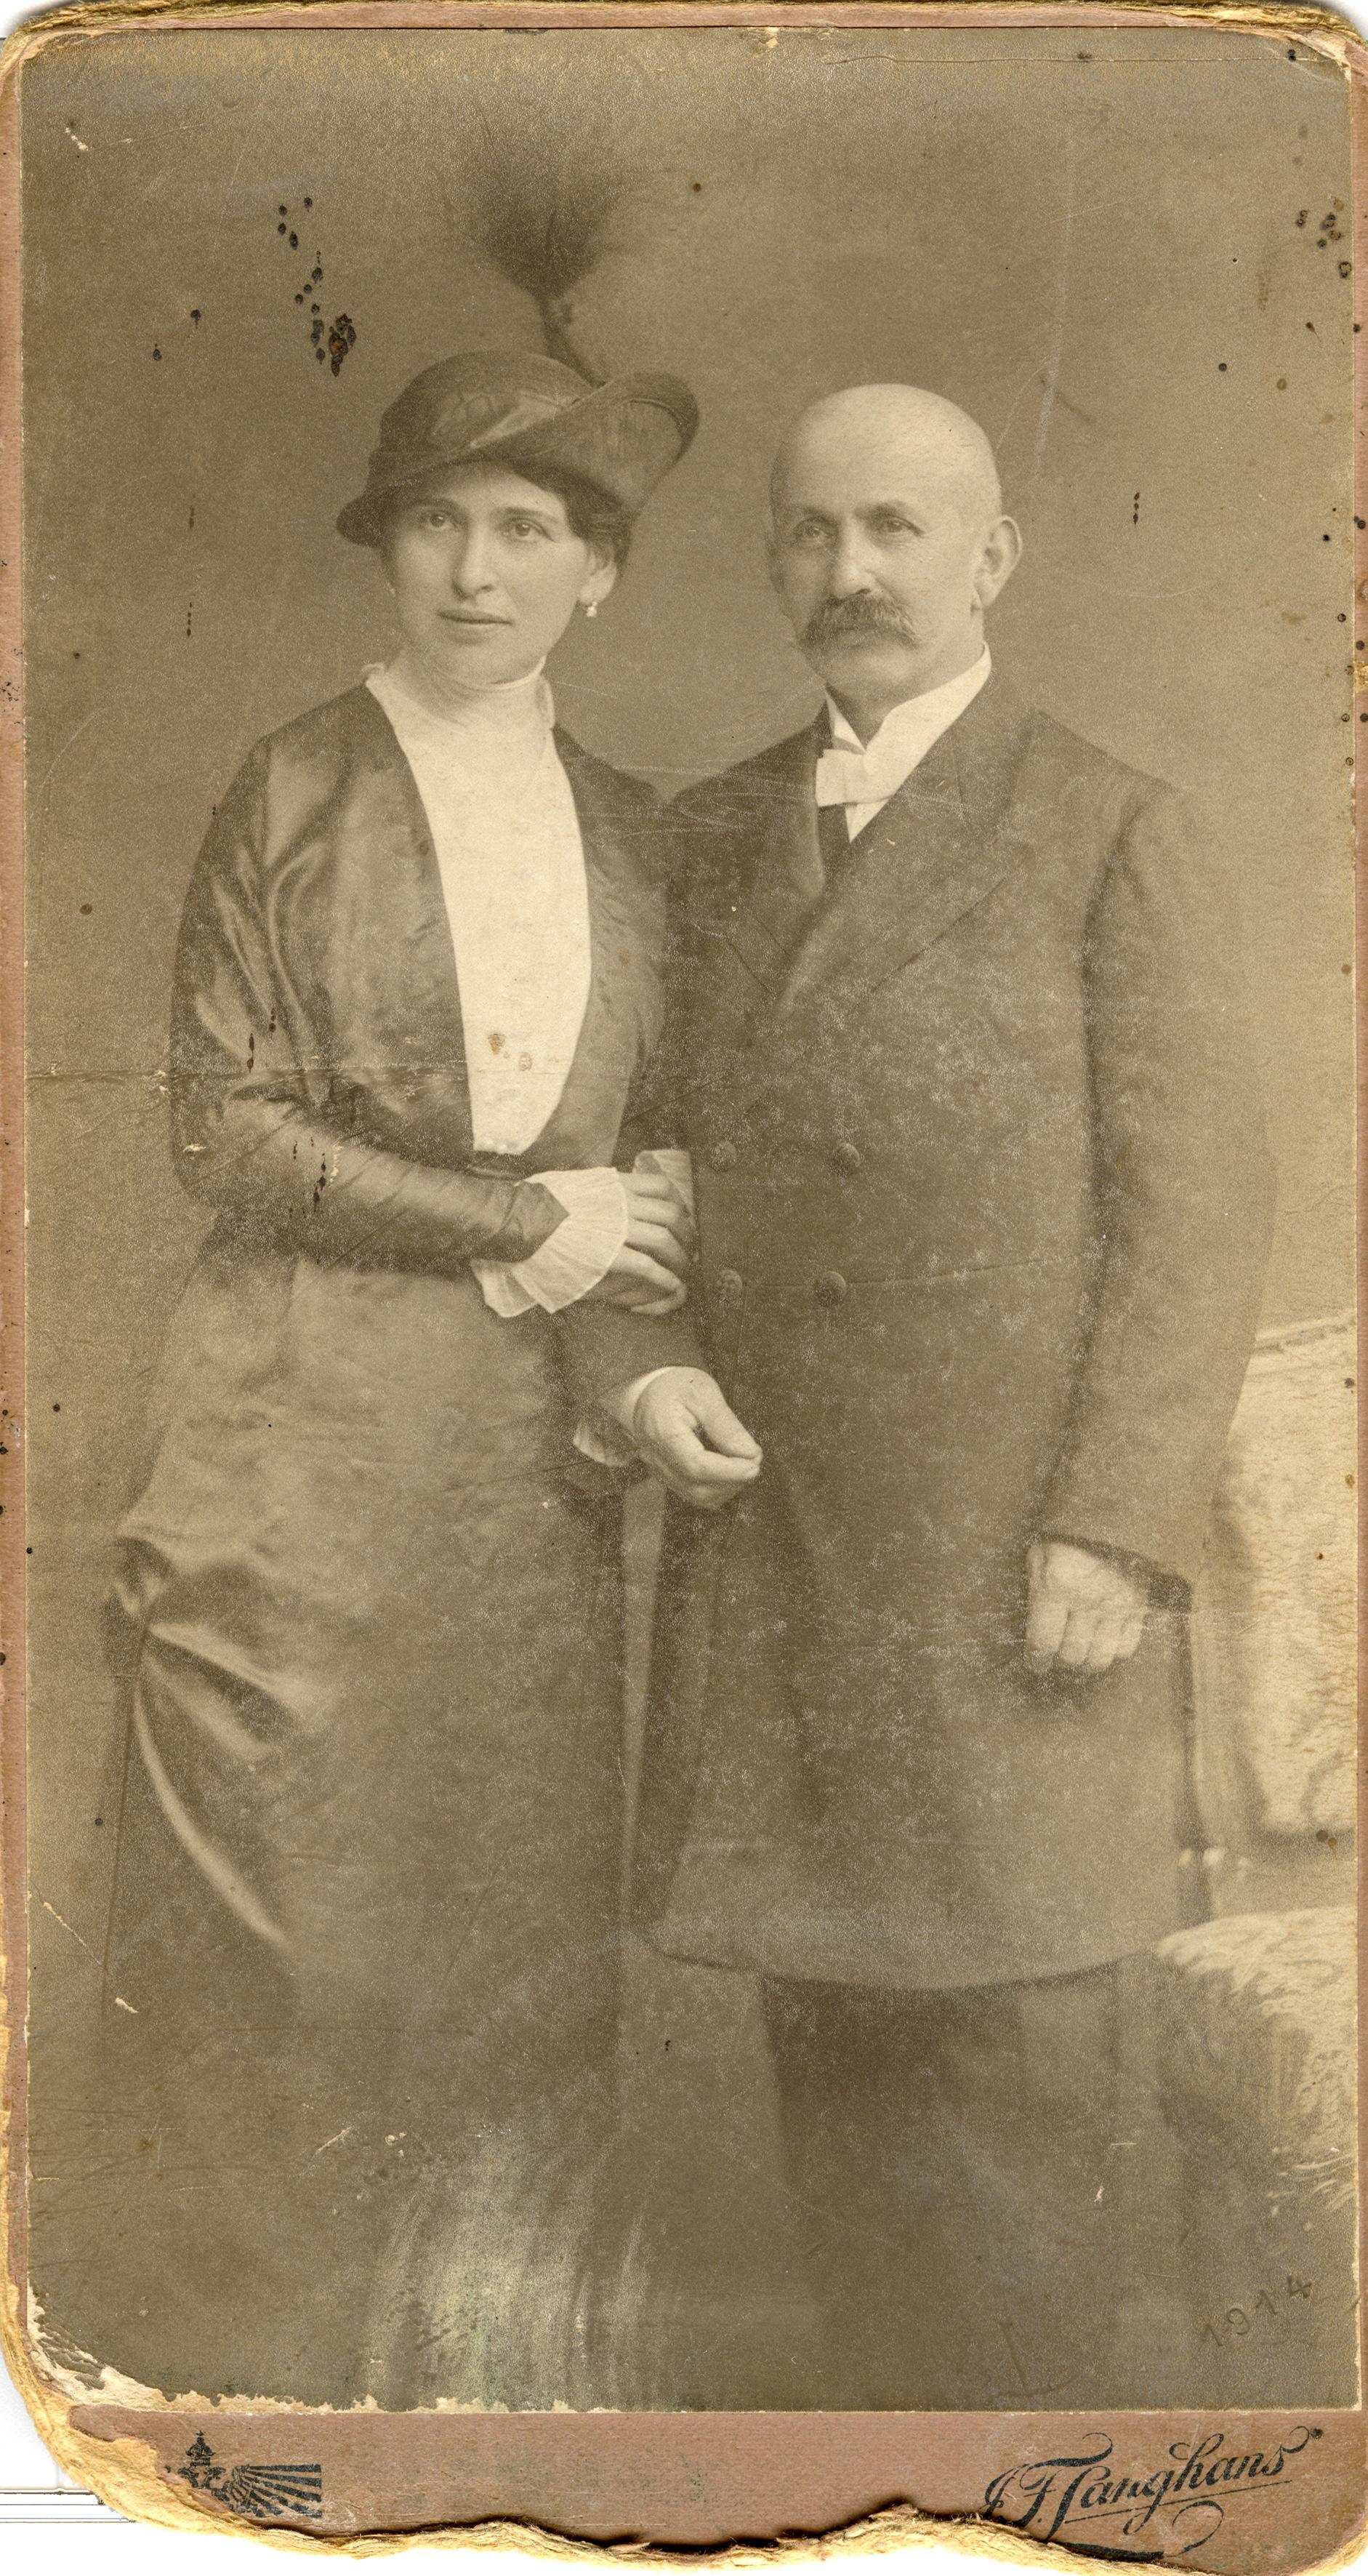 Emanuel and Marie Novak